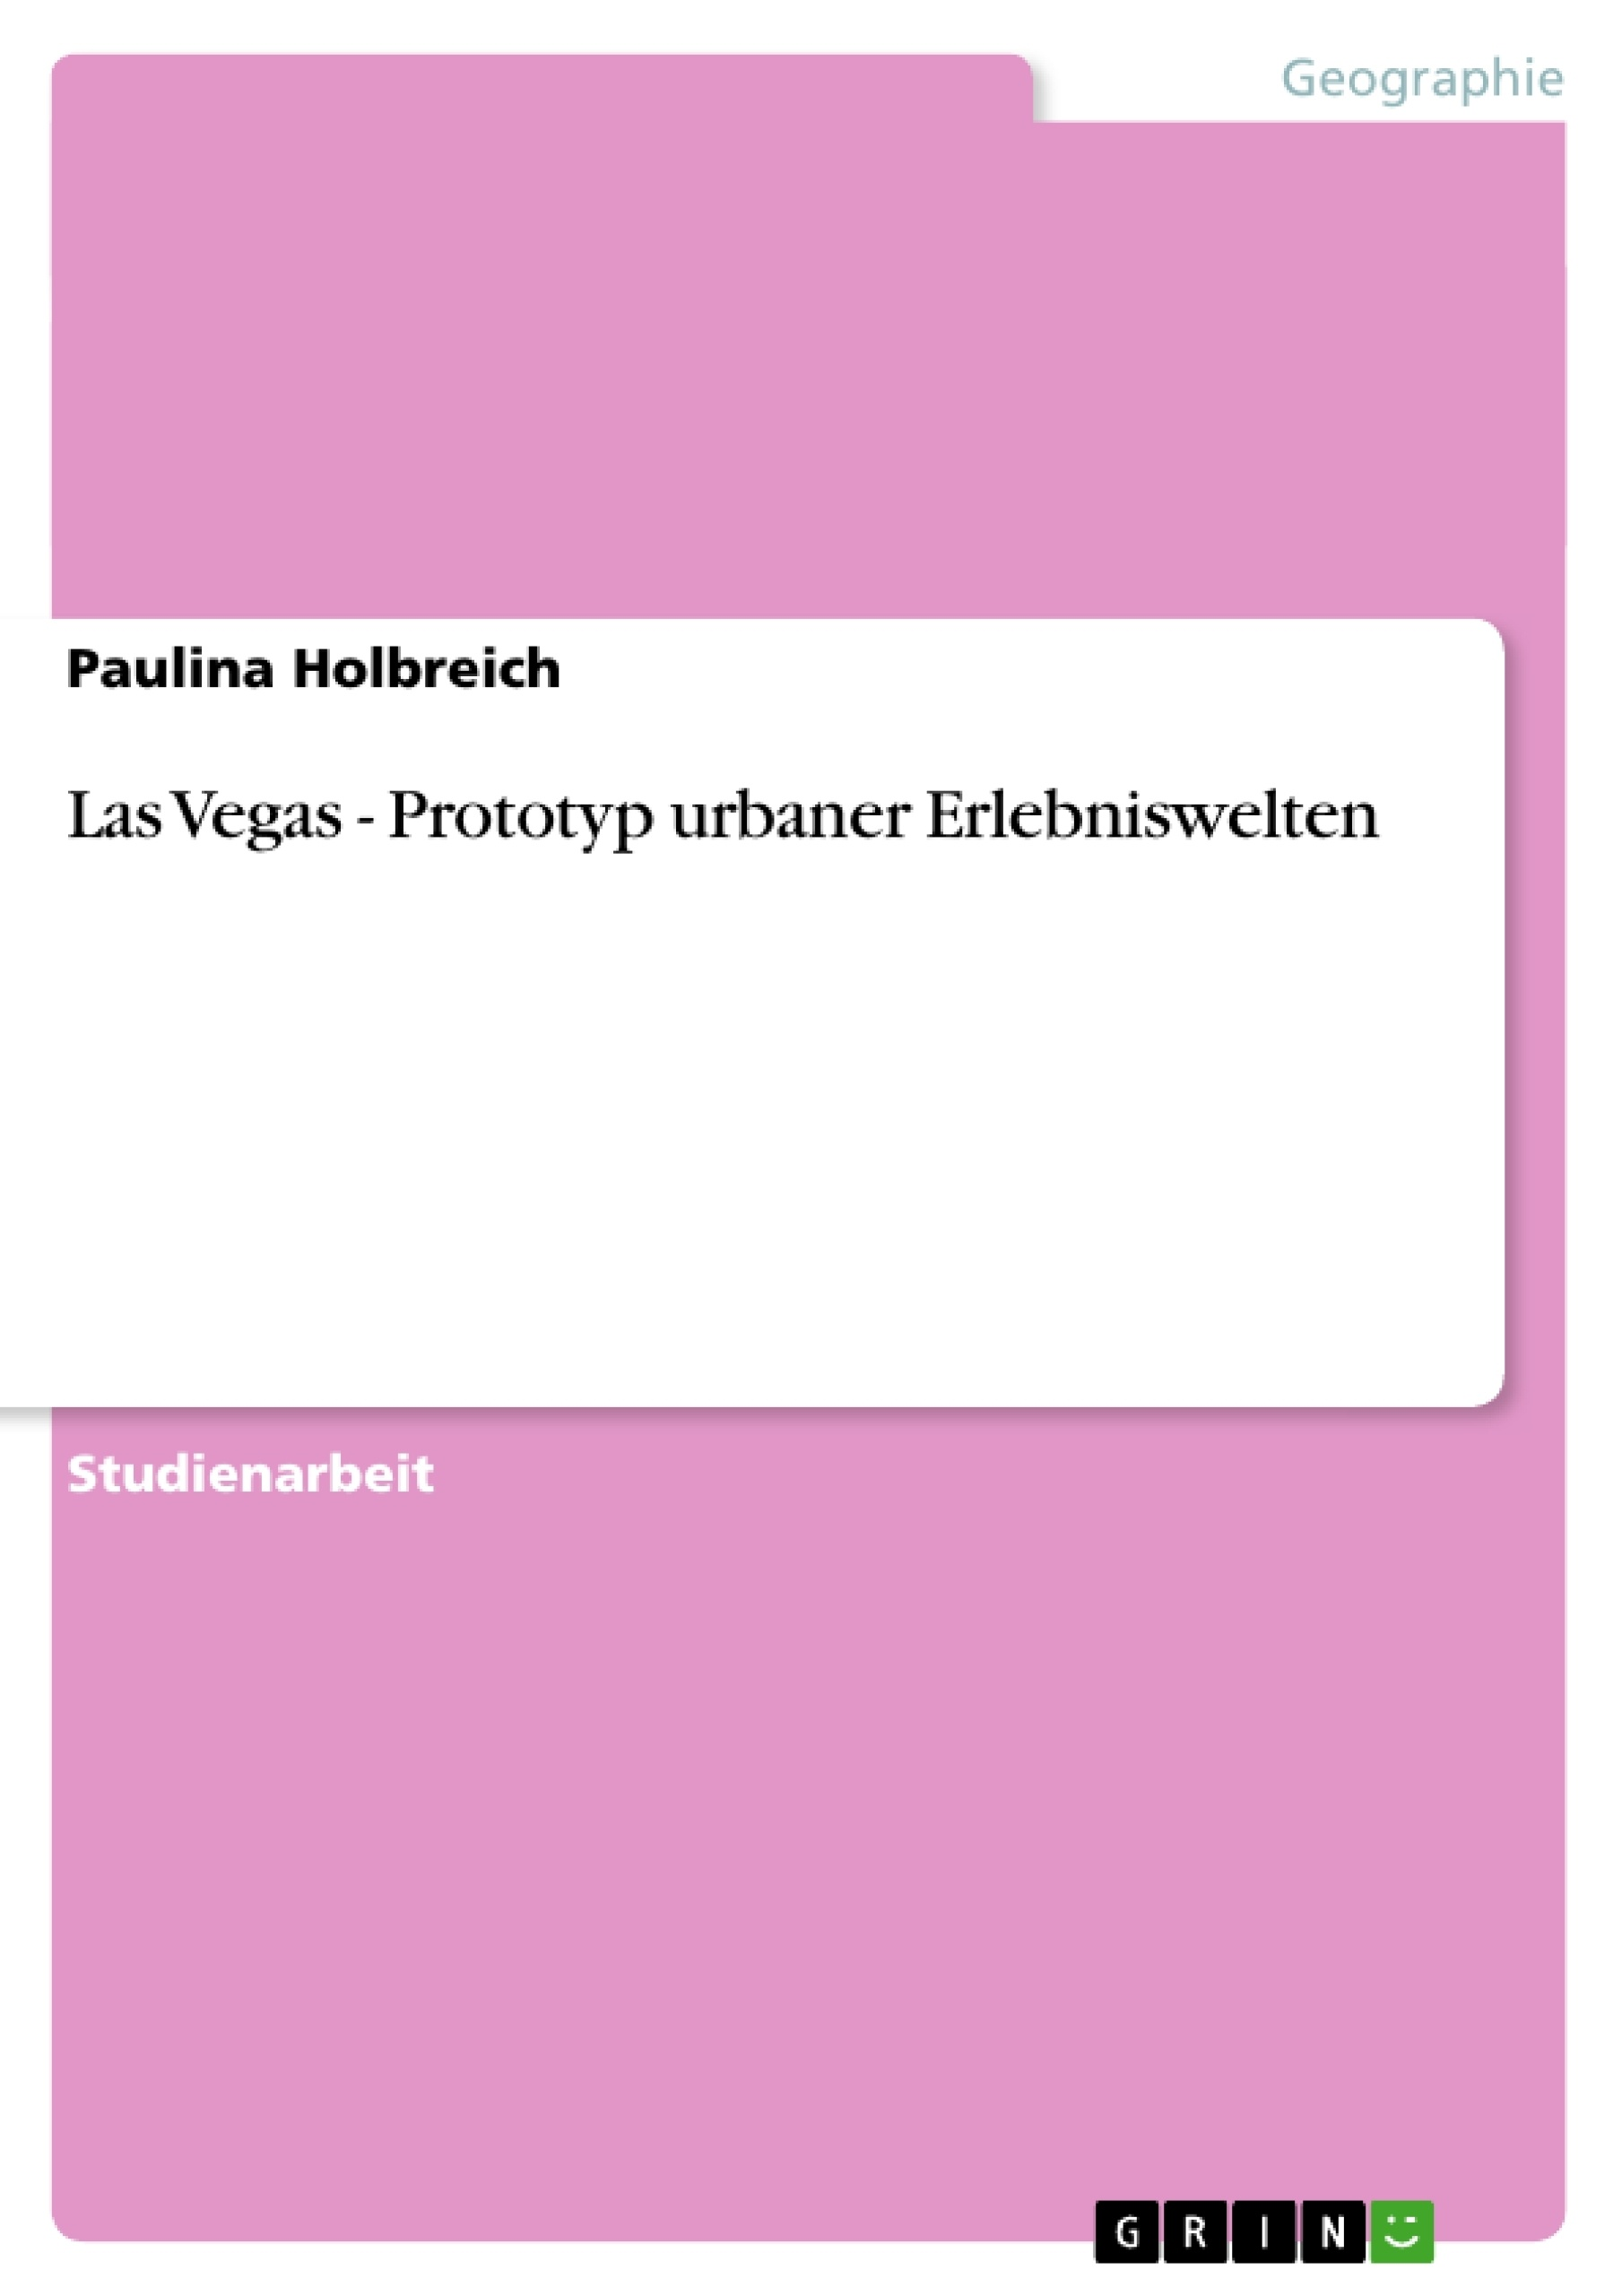 Titel: Las Vegas - Prototyp urbaner Erlebniswelten